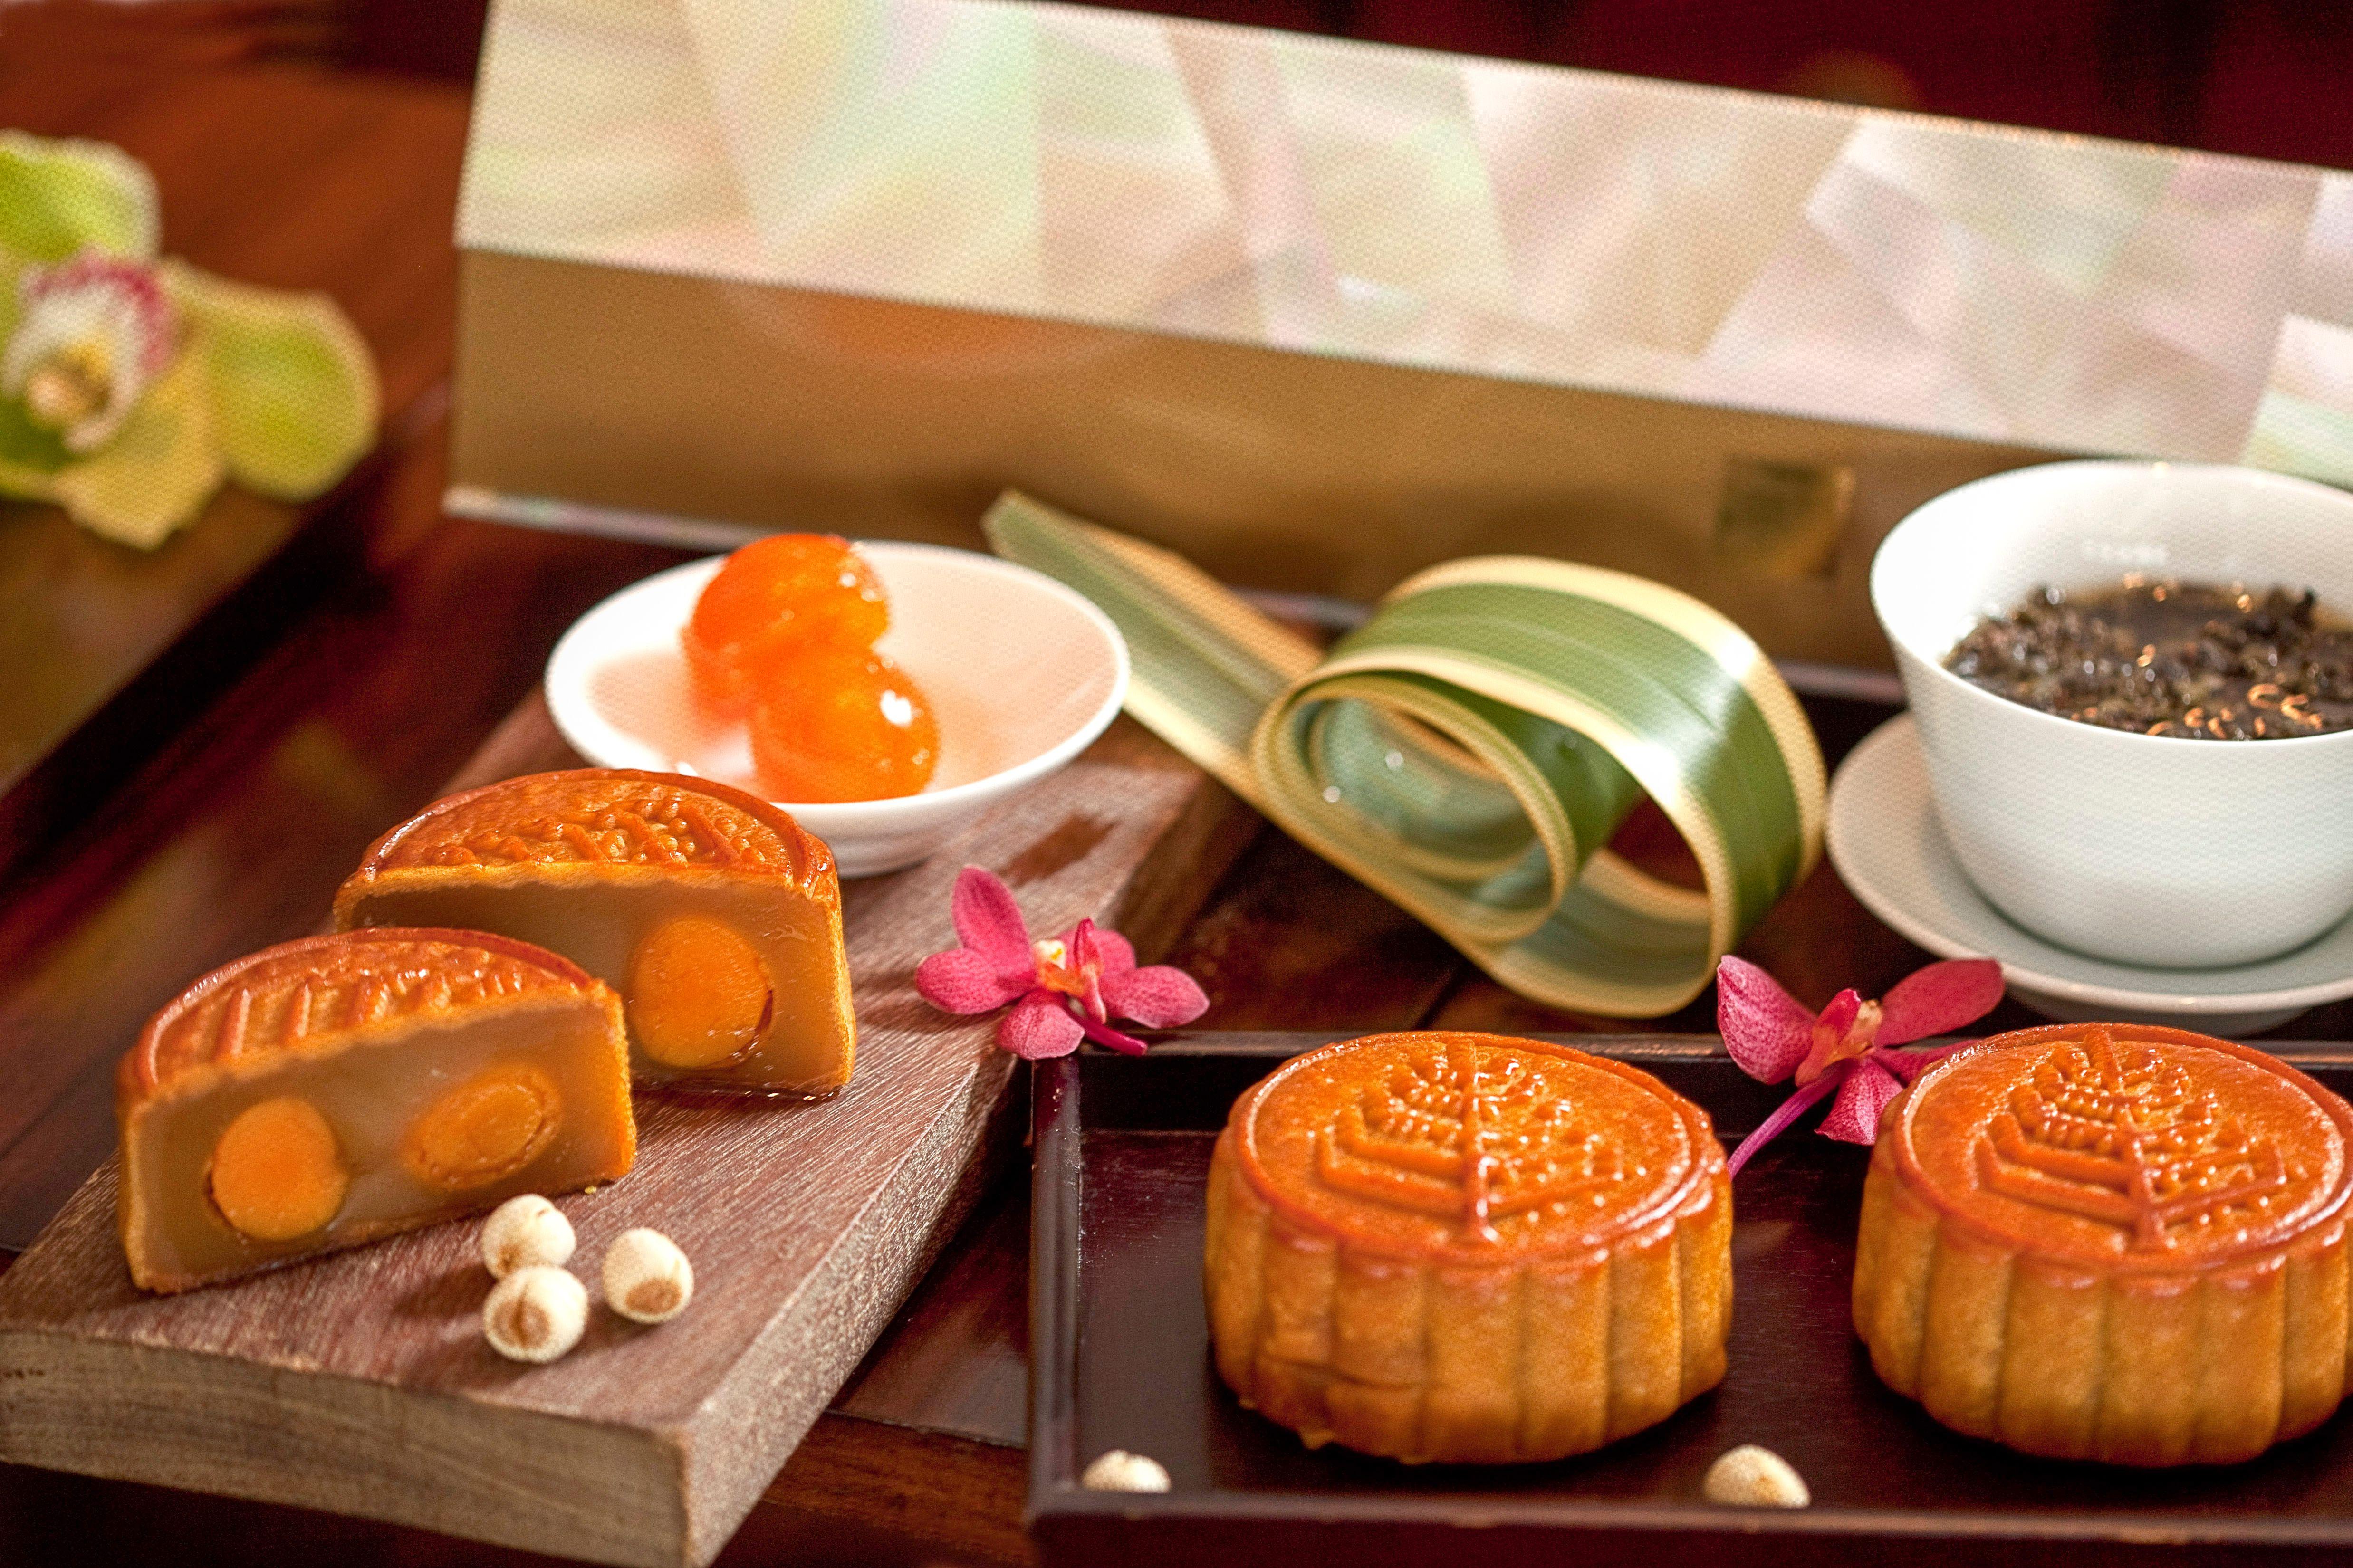 Mooncakes for the Mid-Autumn Festival in September.